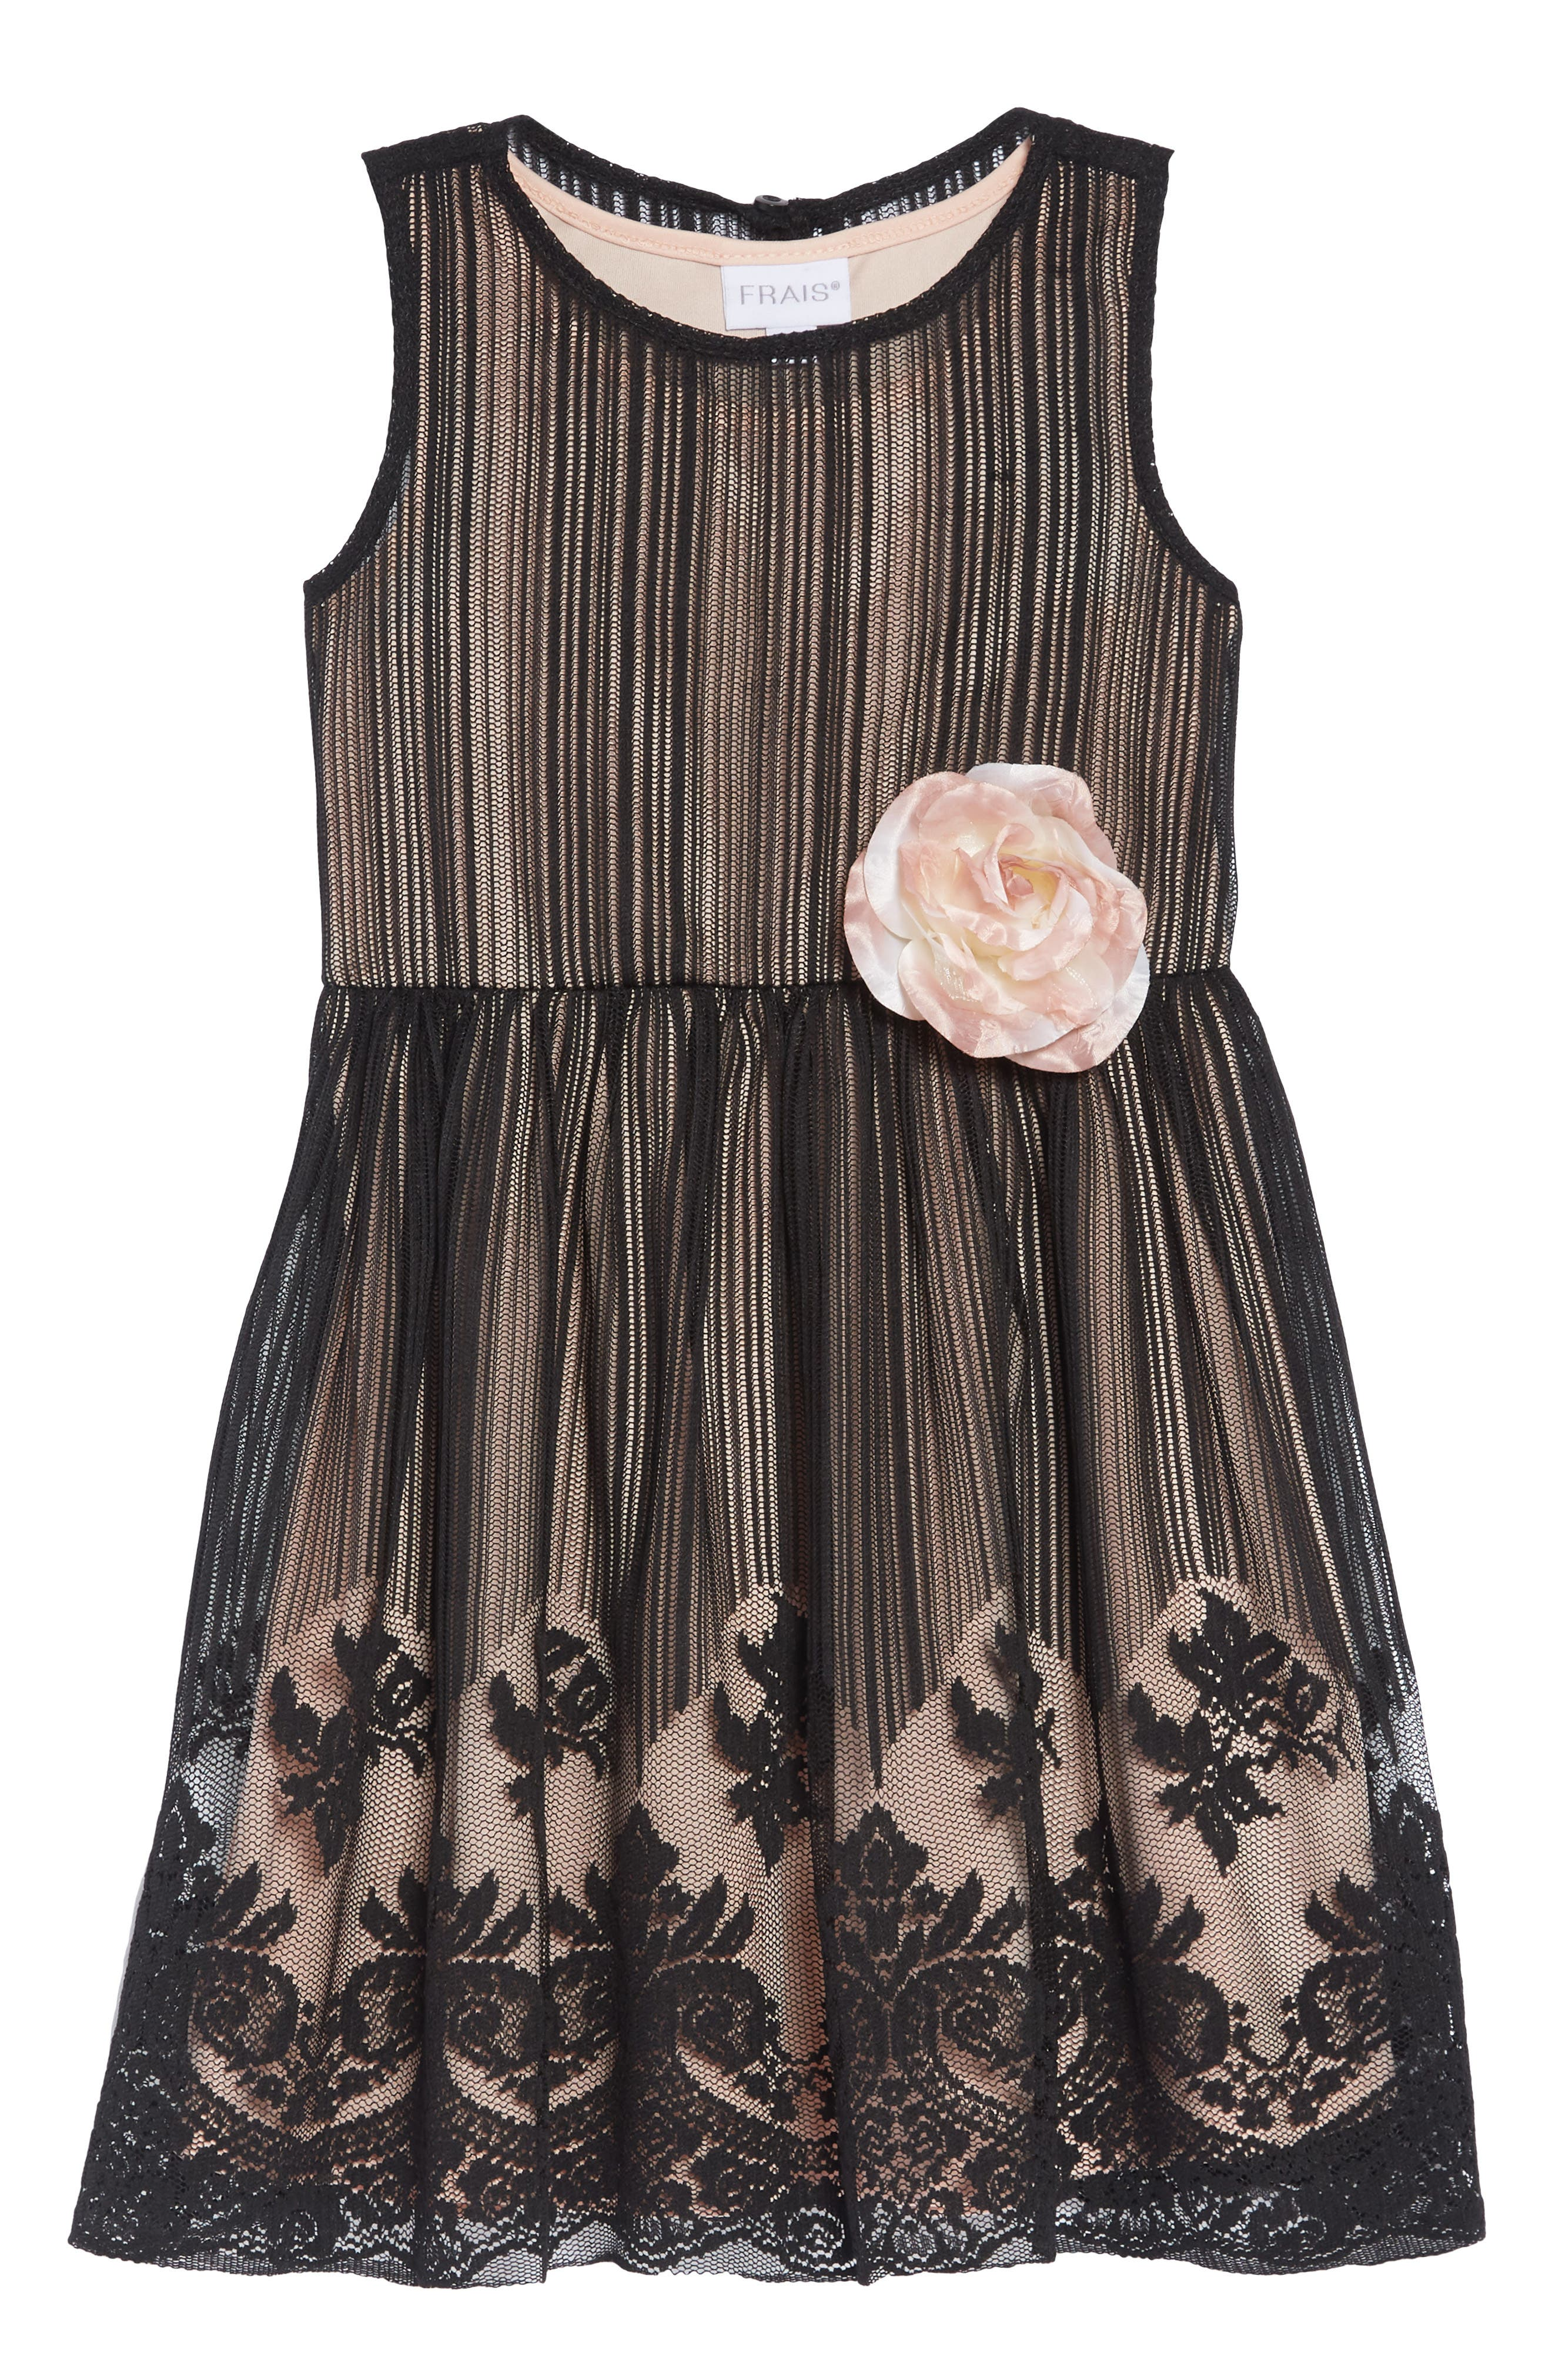 Mesh Overlay Dress,                             Main thumbnail 1, color,                             BLACK/ NUDE